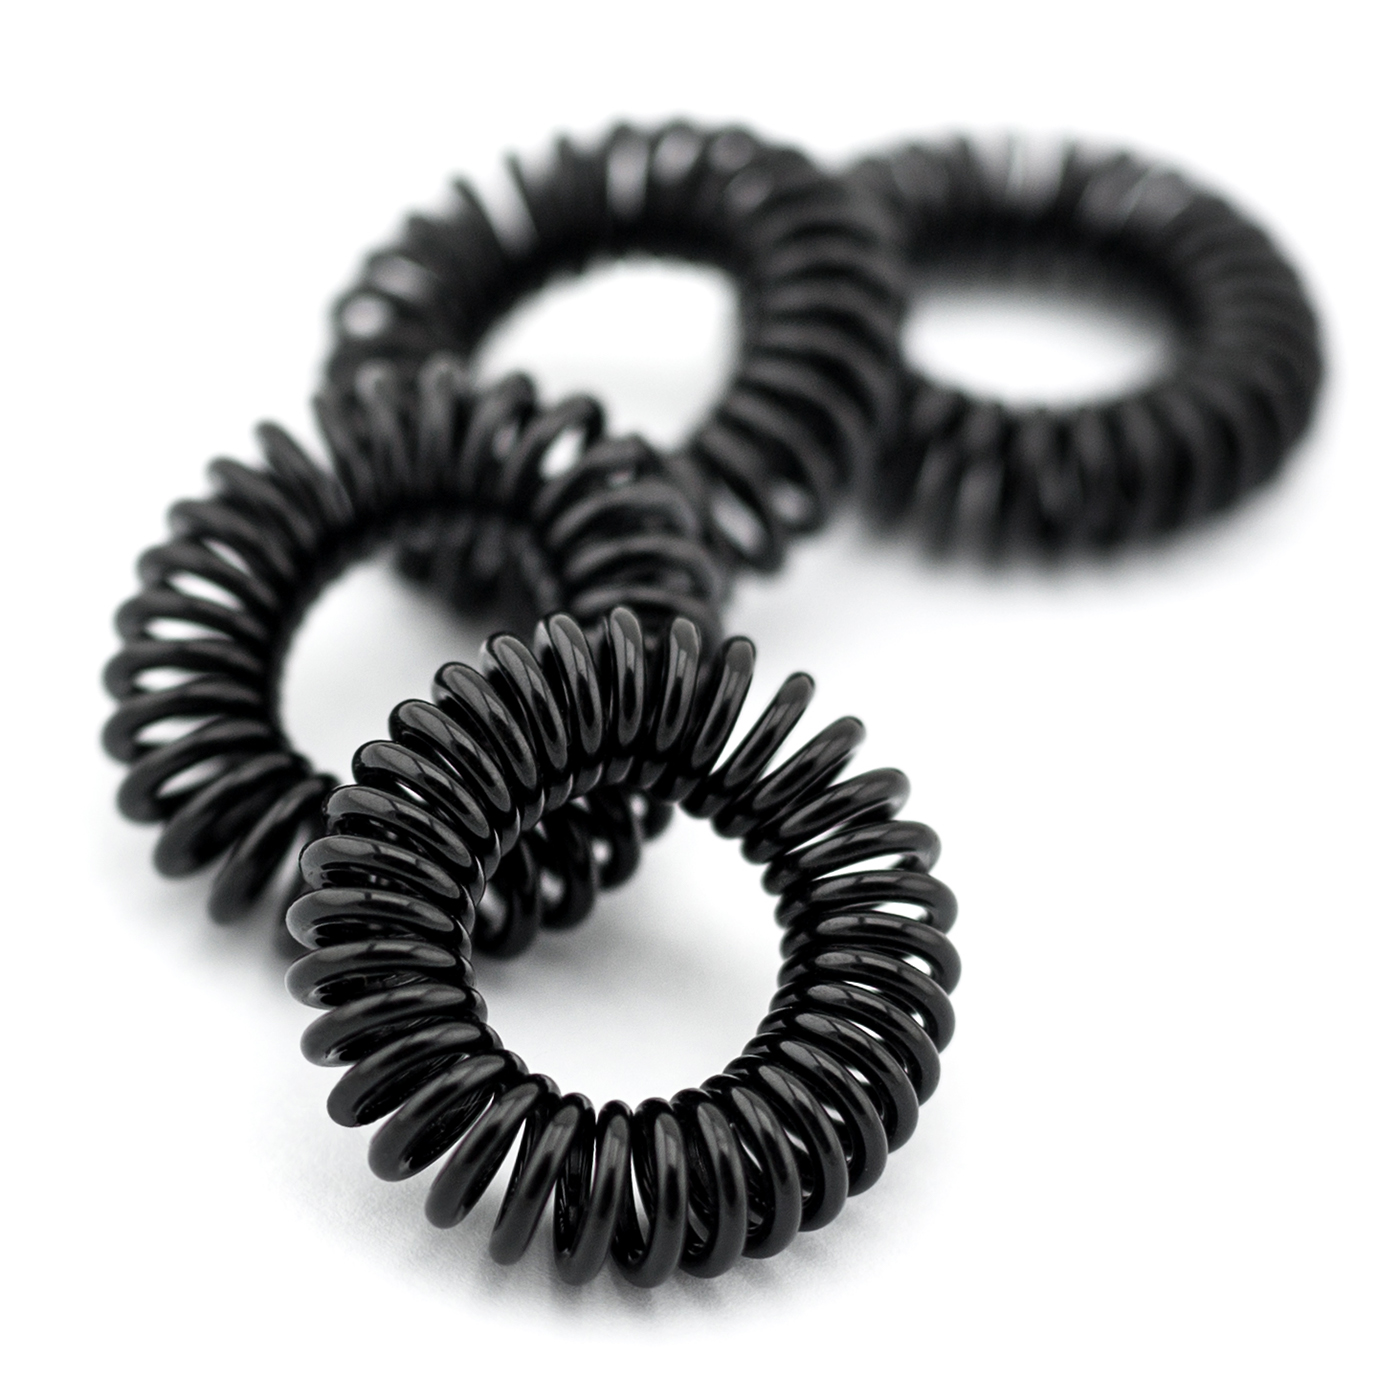 Haargummi schwarz elastisch 4er Set ,Telefonkabel Kunststoff-Spirale